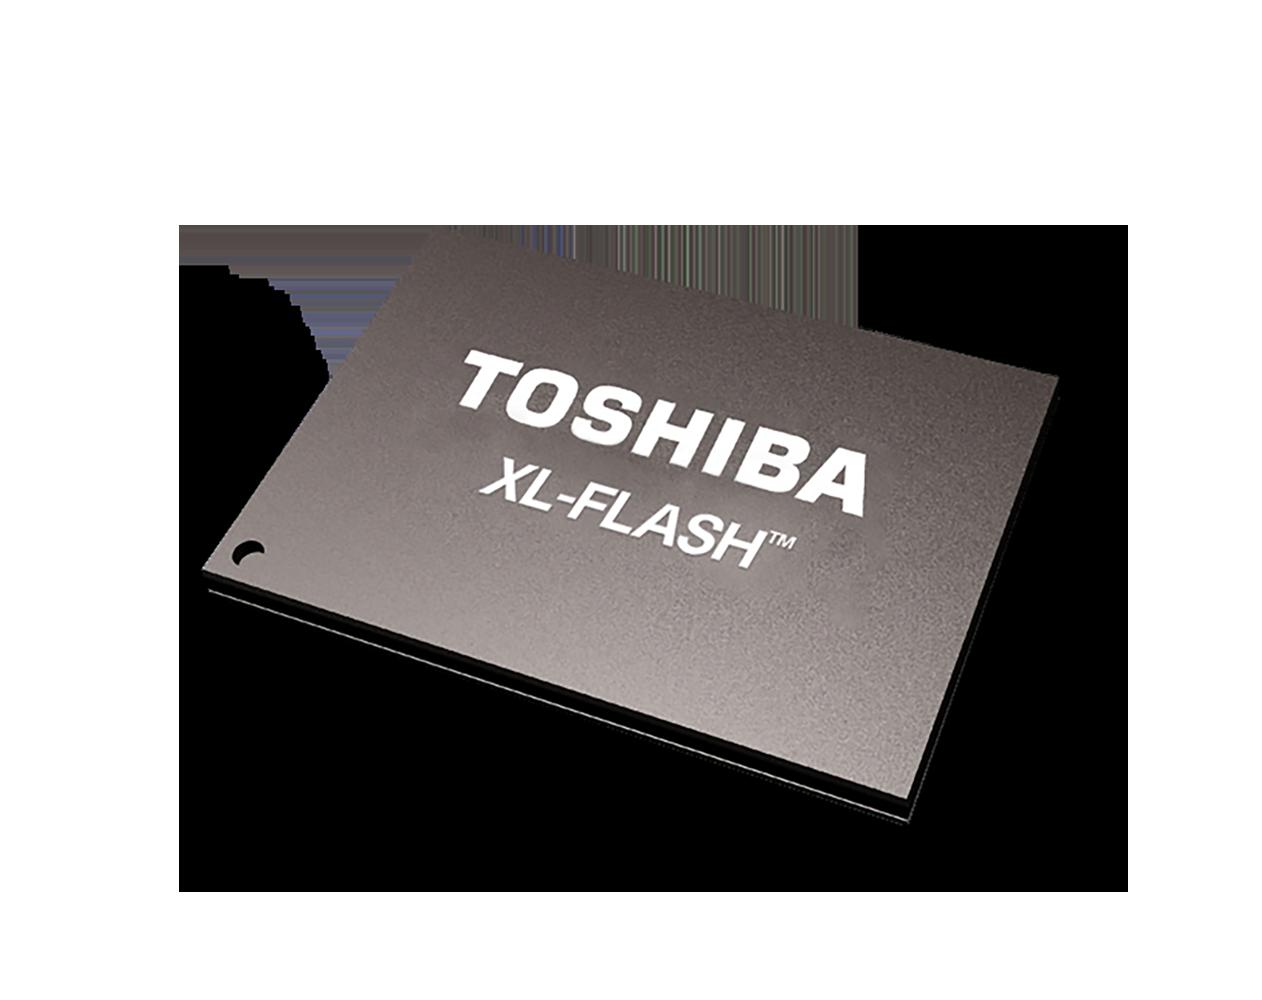 Флеш память Toshiba XL-FLASH для хранилищ данных